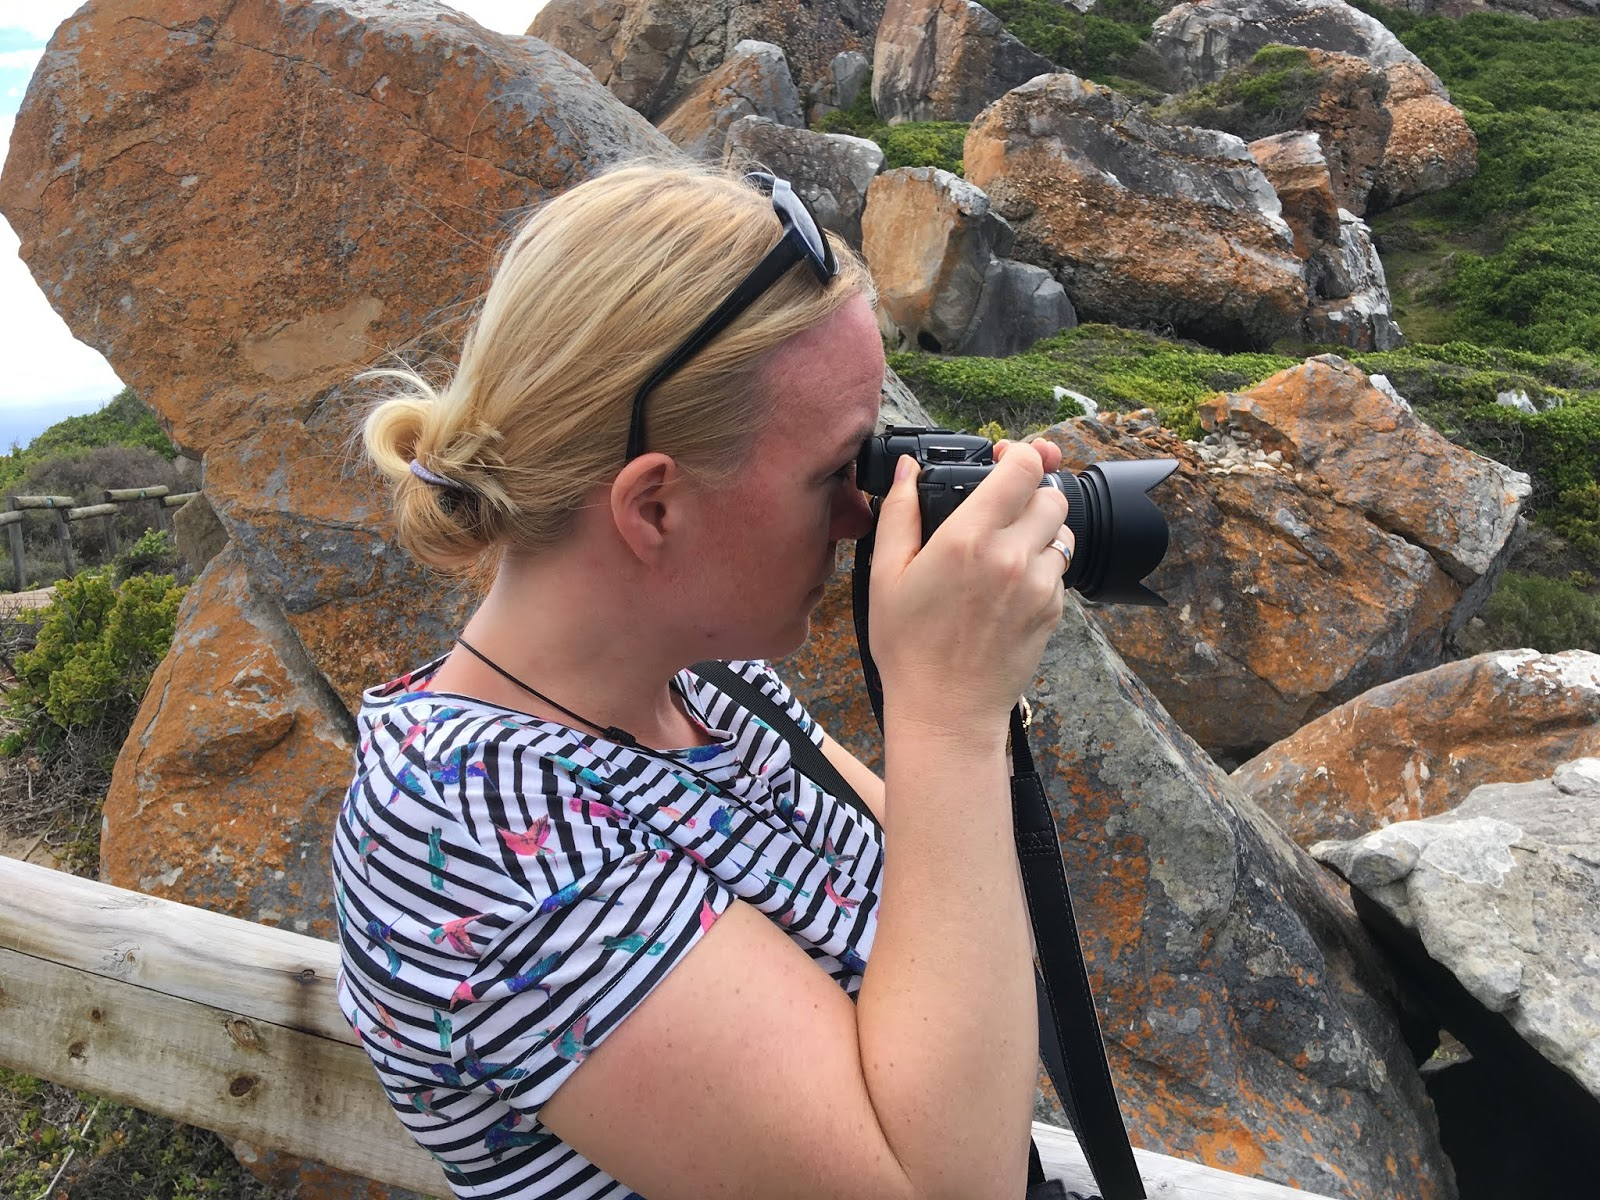 Fotografieren entlang der Garden Route